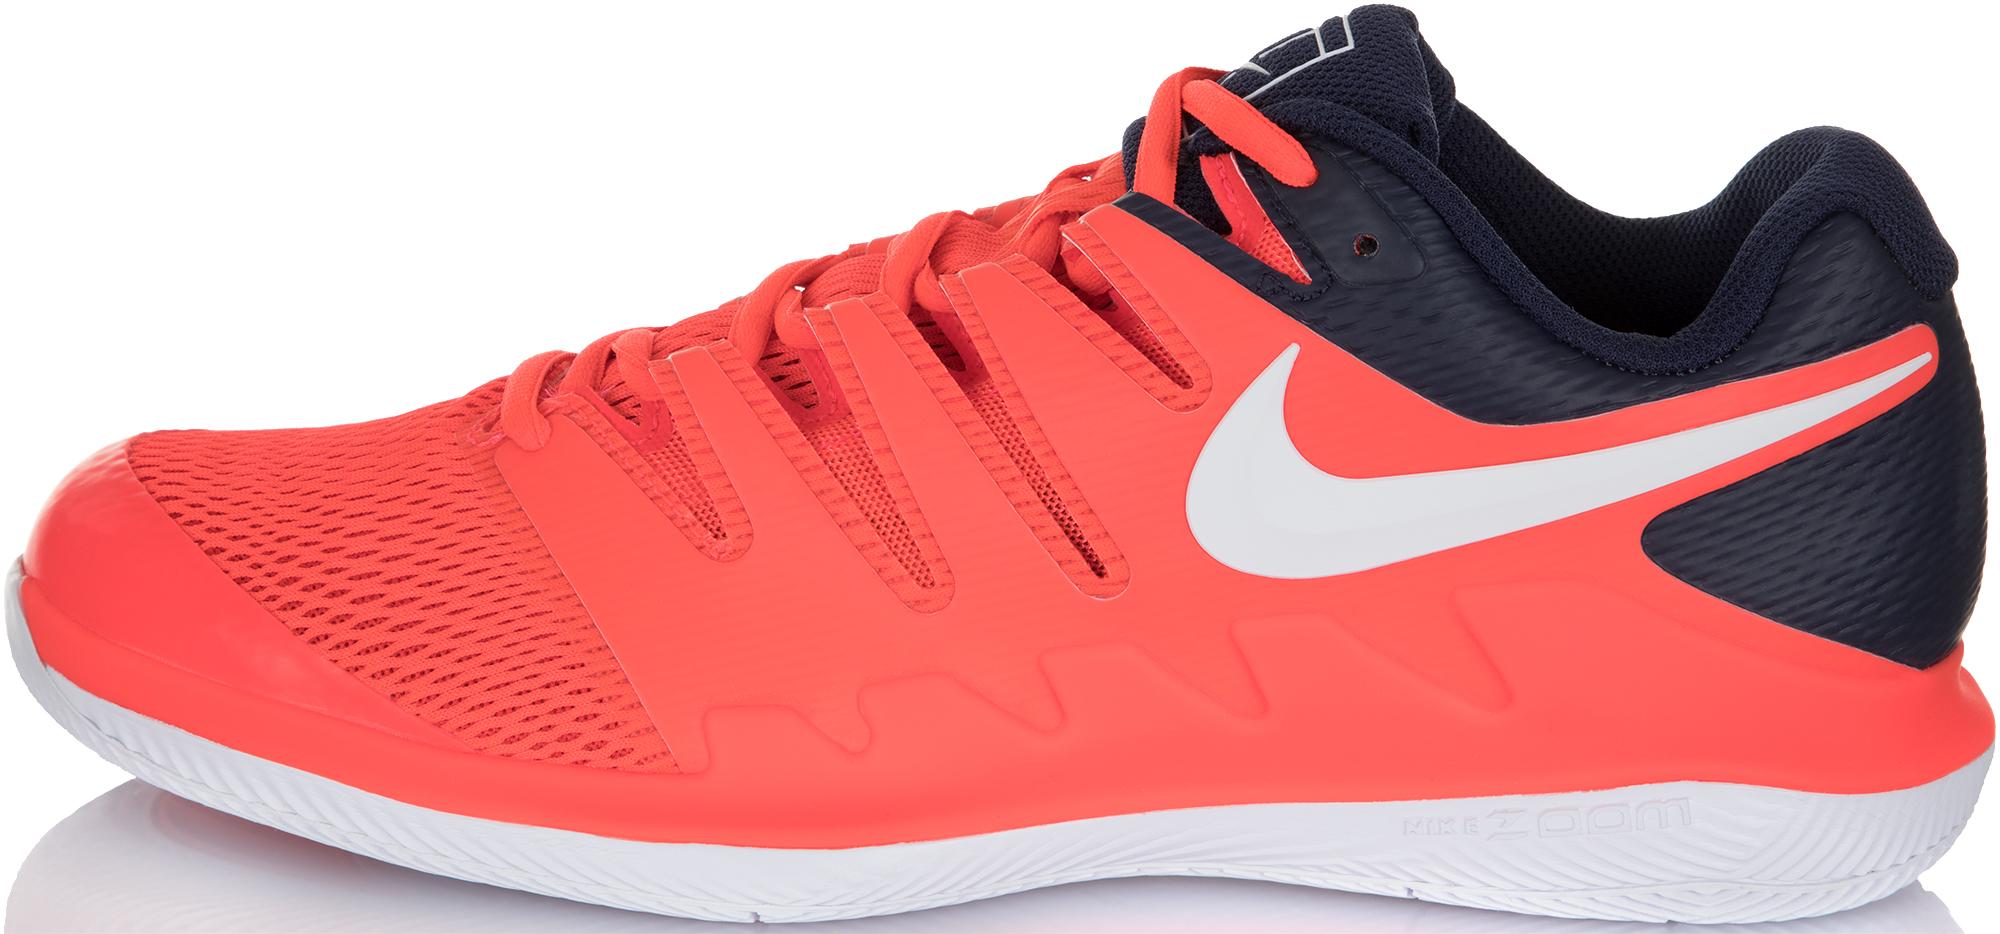 Nike Кроссовки мужские Nike Air Zoom Vapor X, размер 46,5 цена